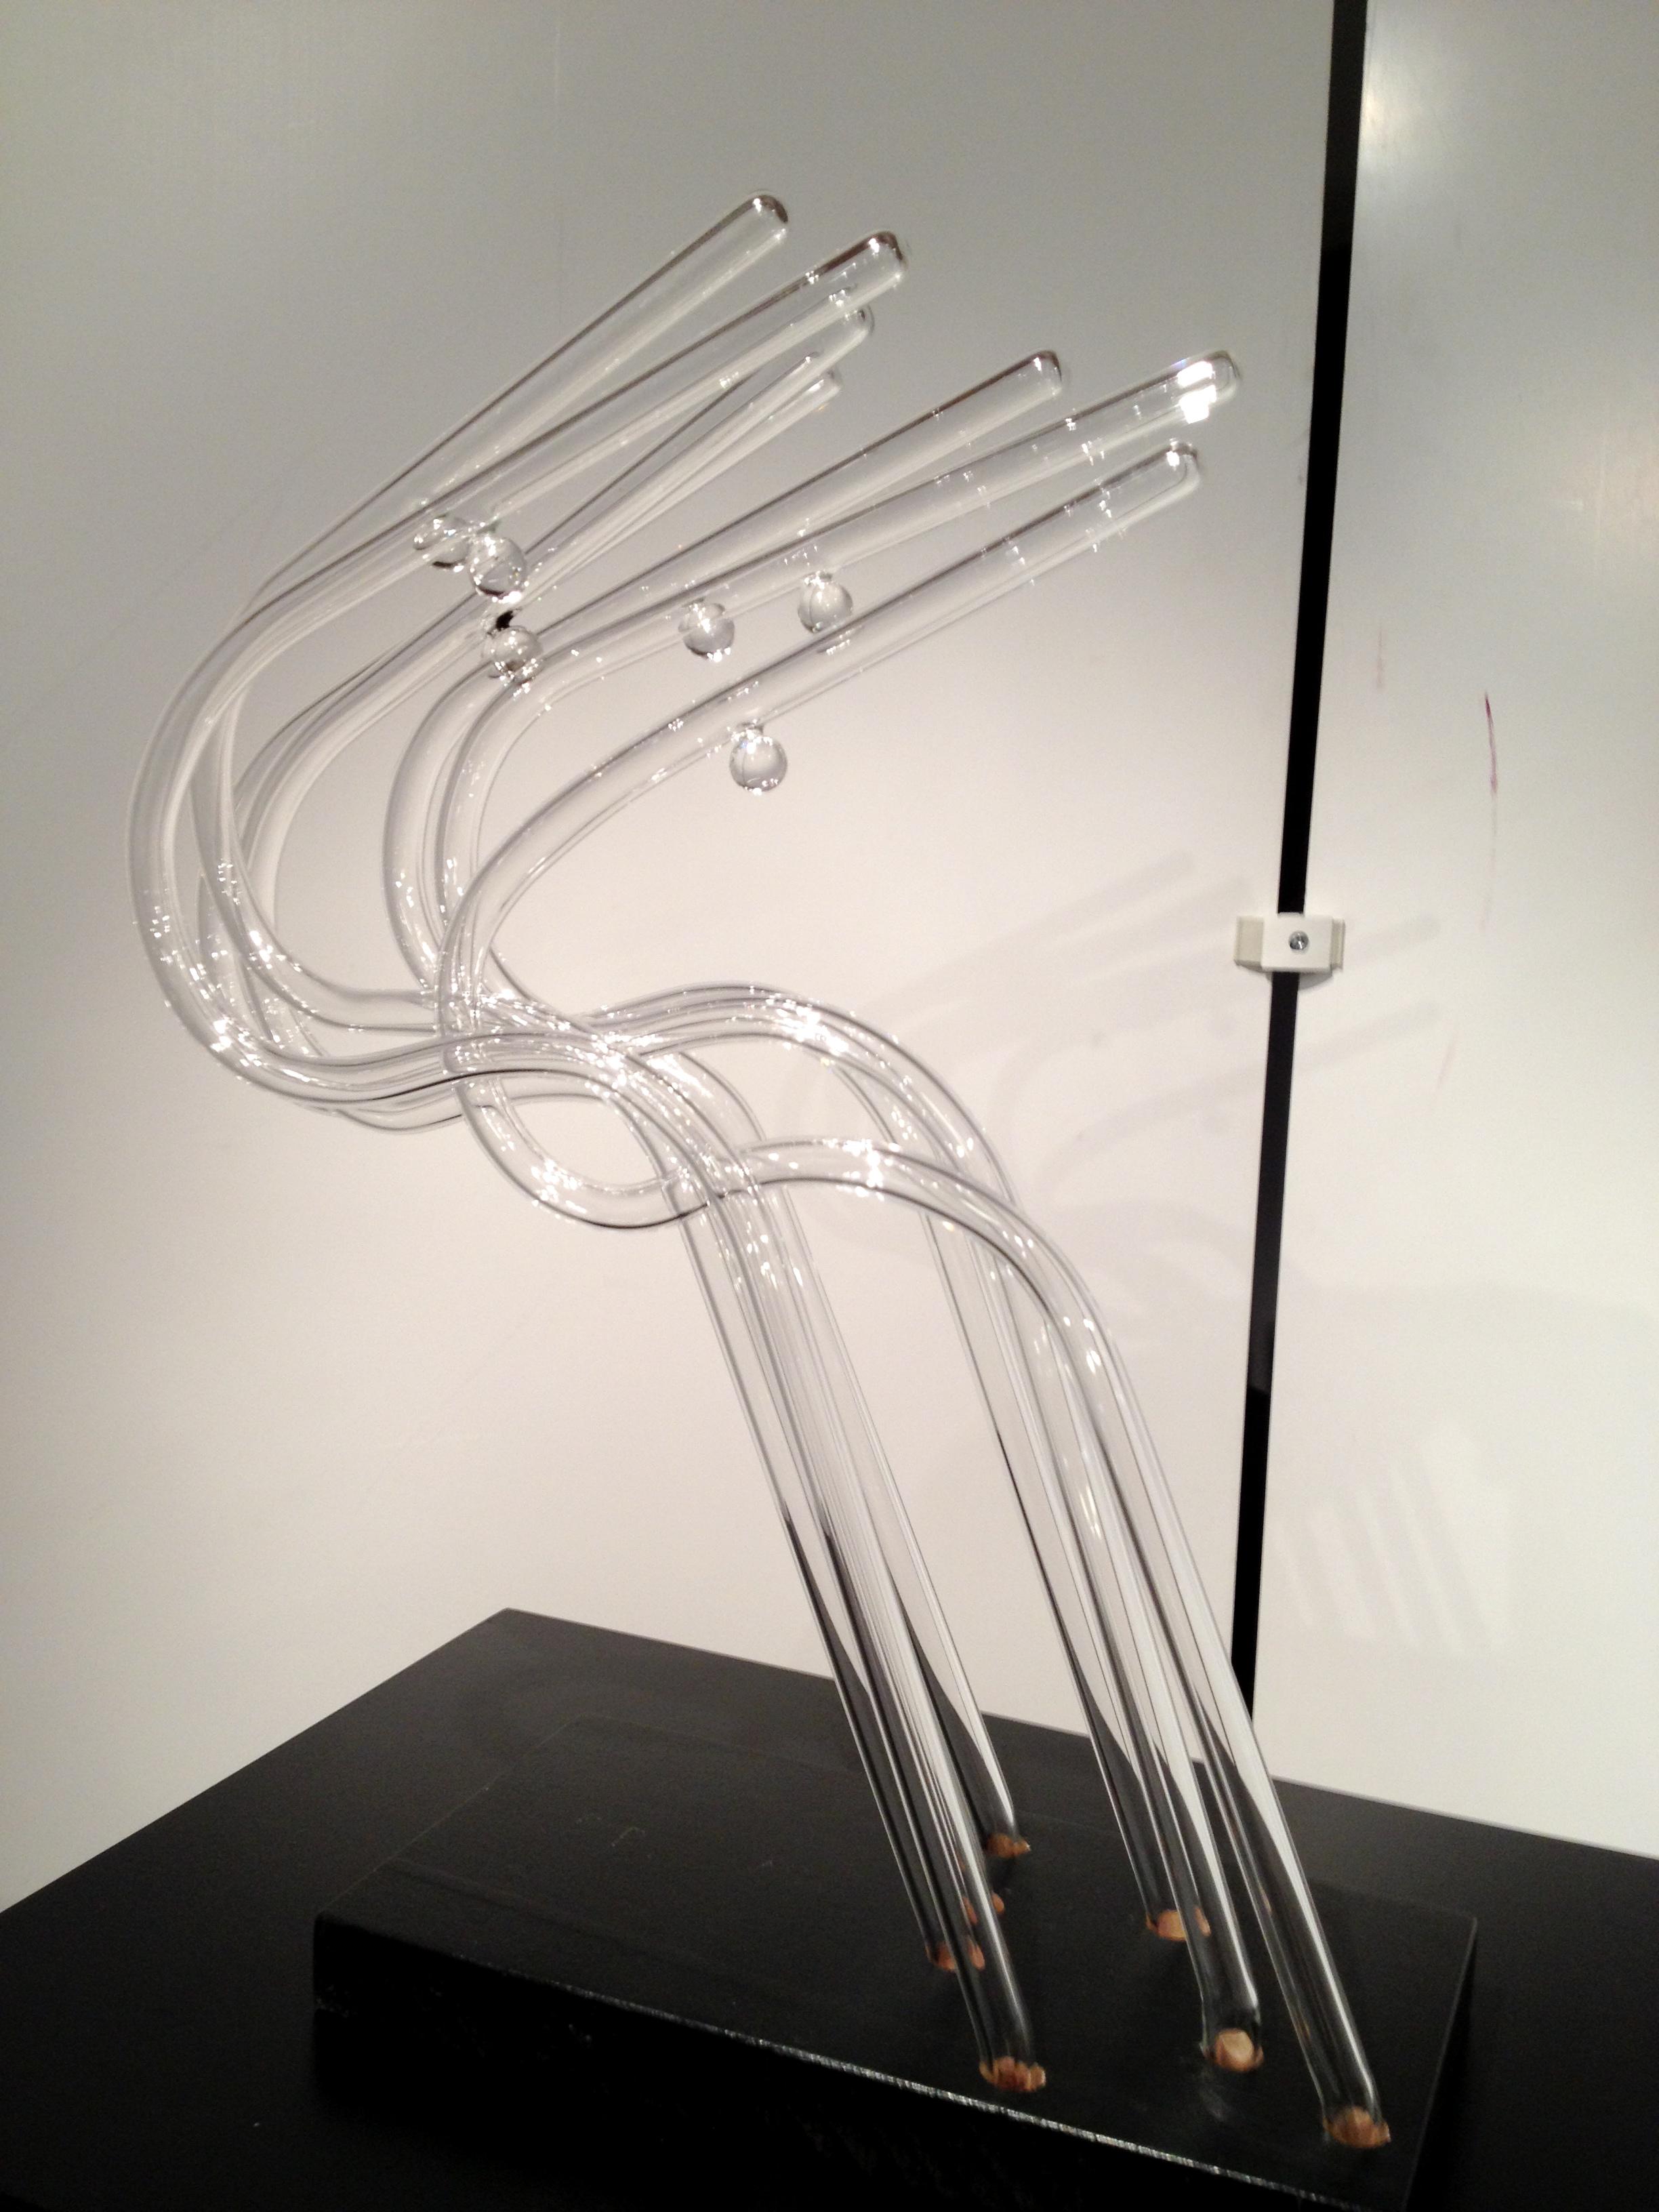 les sculptures en verre souffl de jo l rey entre. Black Bedroom Furniture Sets. Home Design Ideas